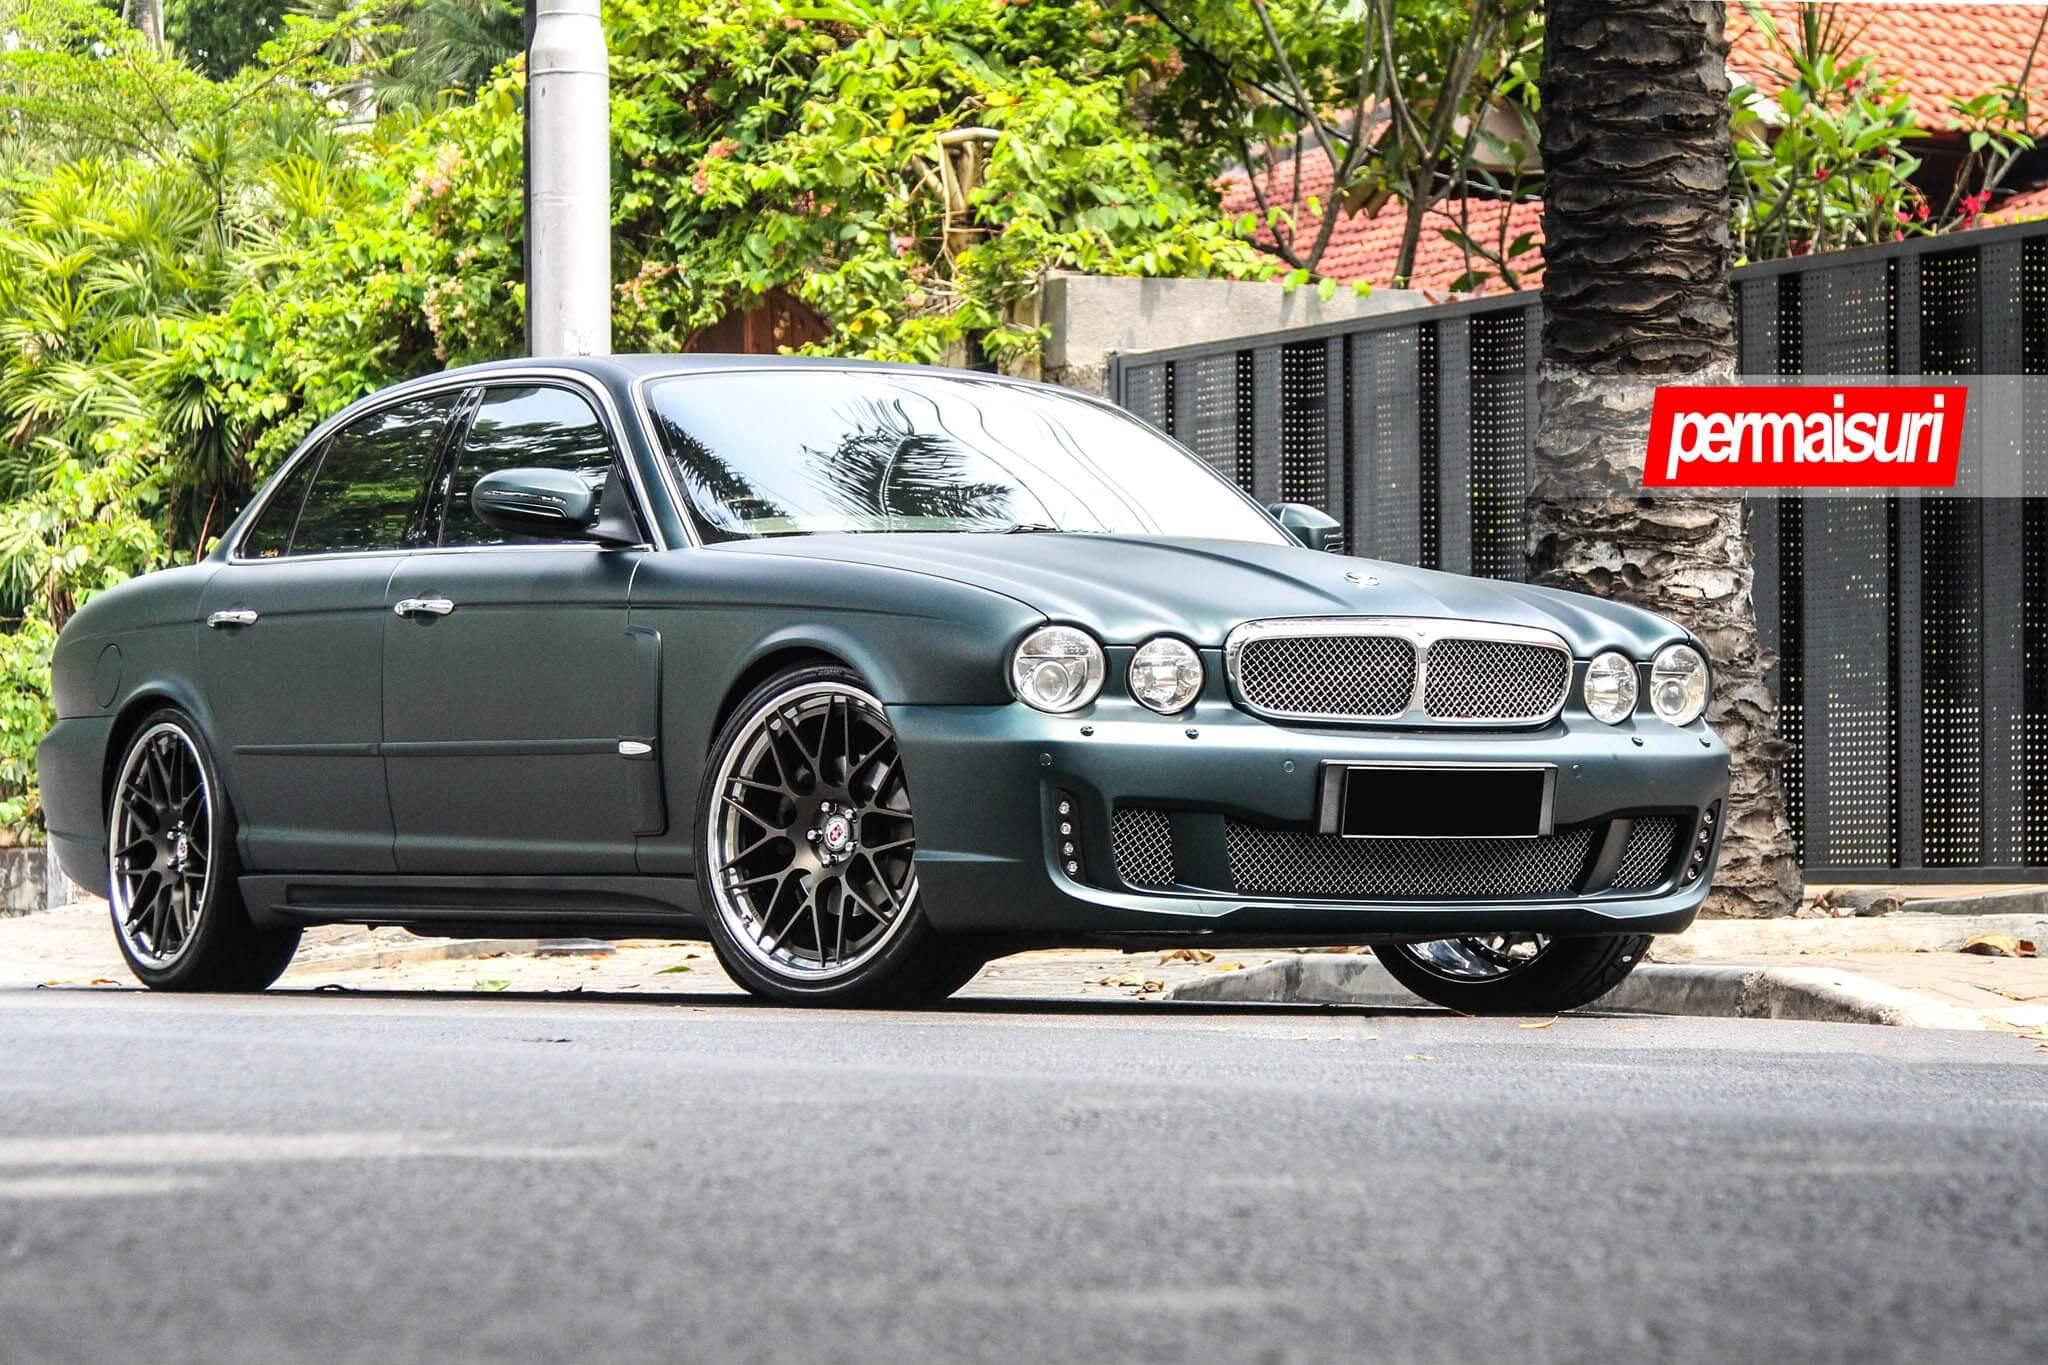 forum views rim size tires st a focus xf on jaguar name wheels mb my